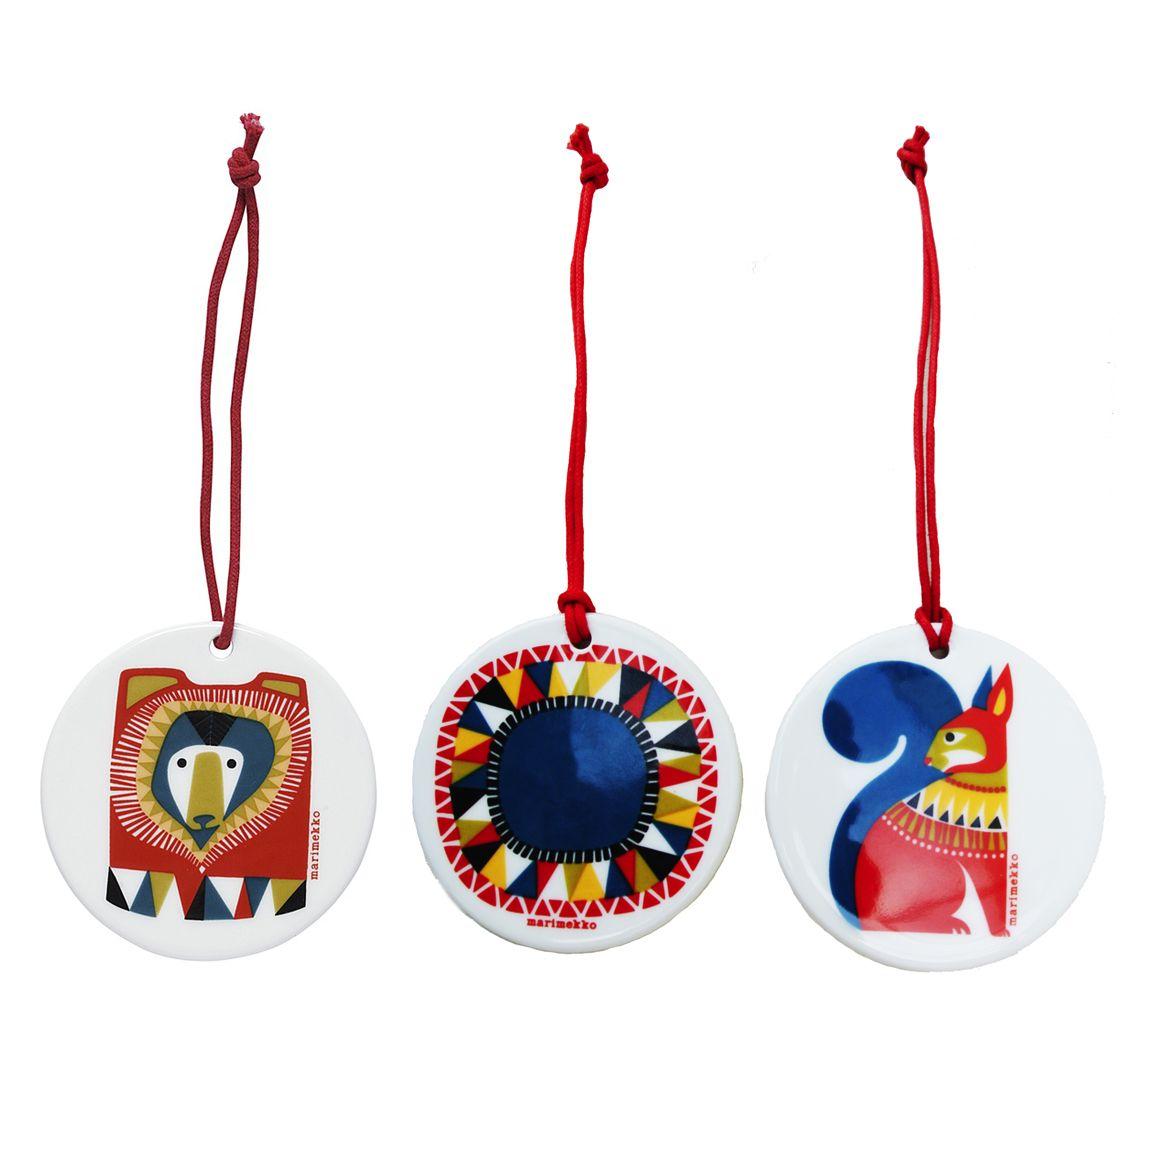 Marimekko Lamppupampula Holiday Ornament : Huset Shop